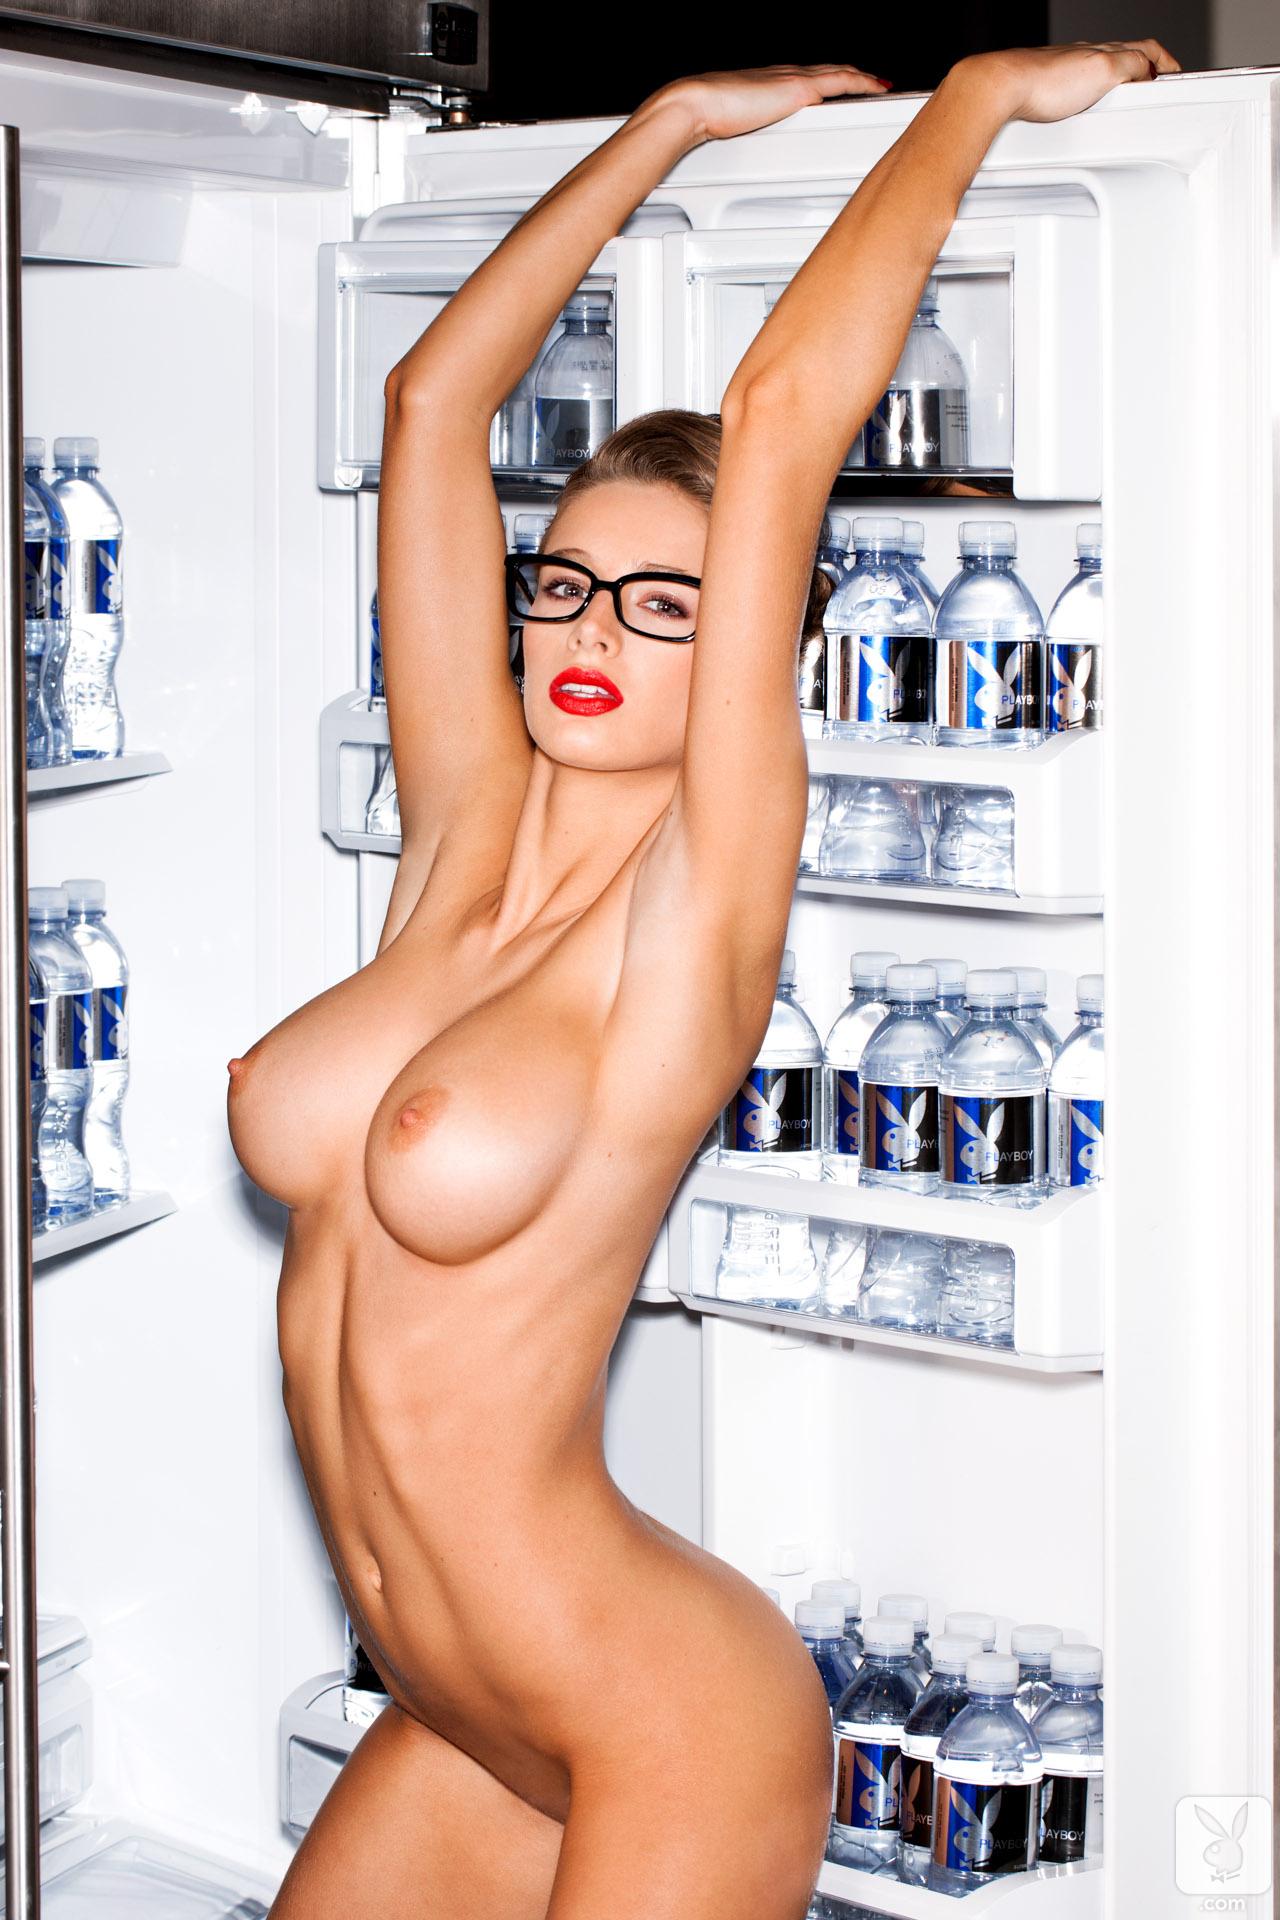 Emily agnes nude playboy 32 RedBust